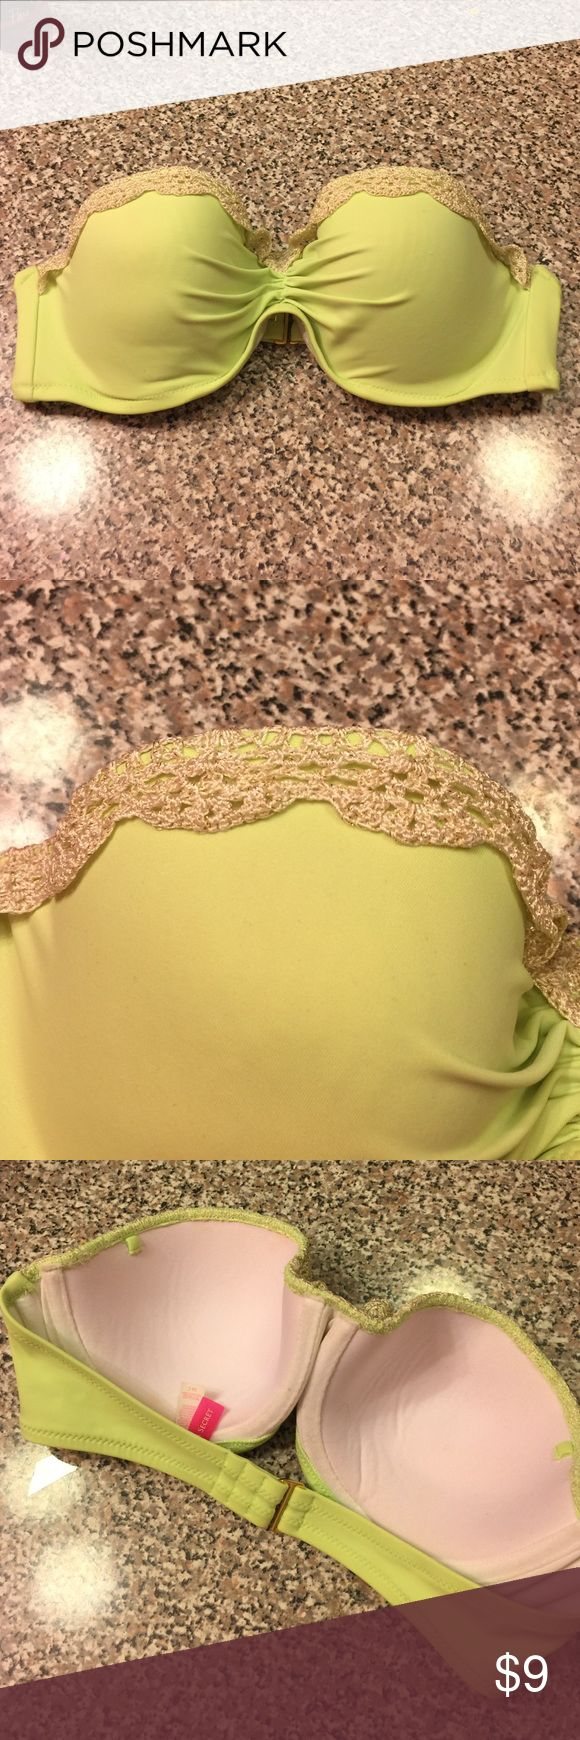 VS swim top Green swim top strapless style // tan crochet detail // 36C // straps are not included Victoria's Secret Swim Bikinis